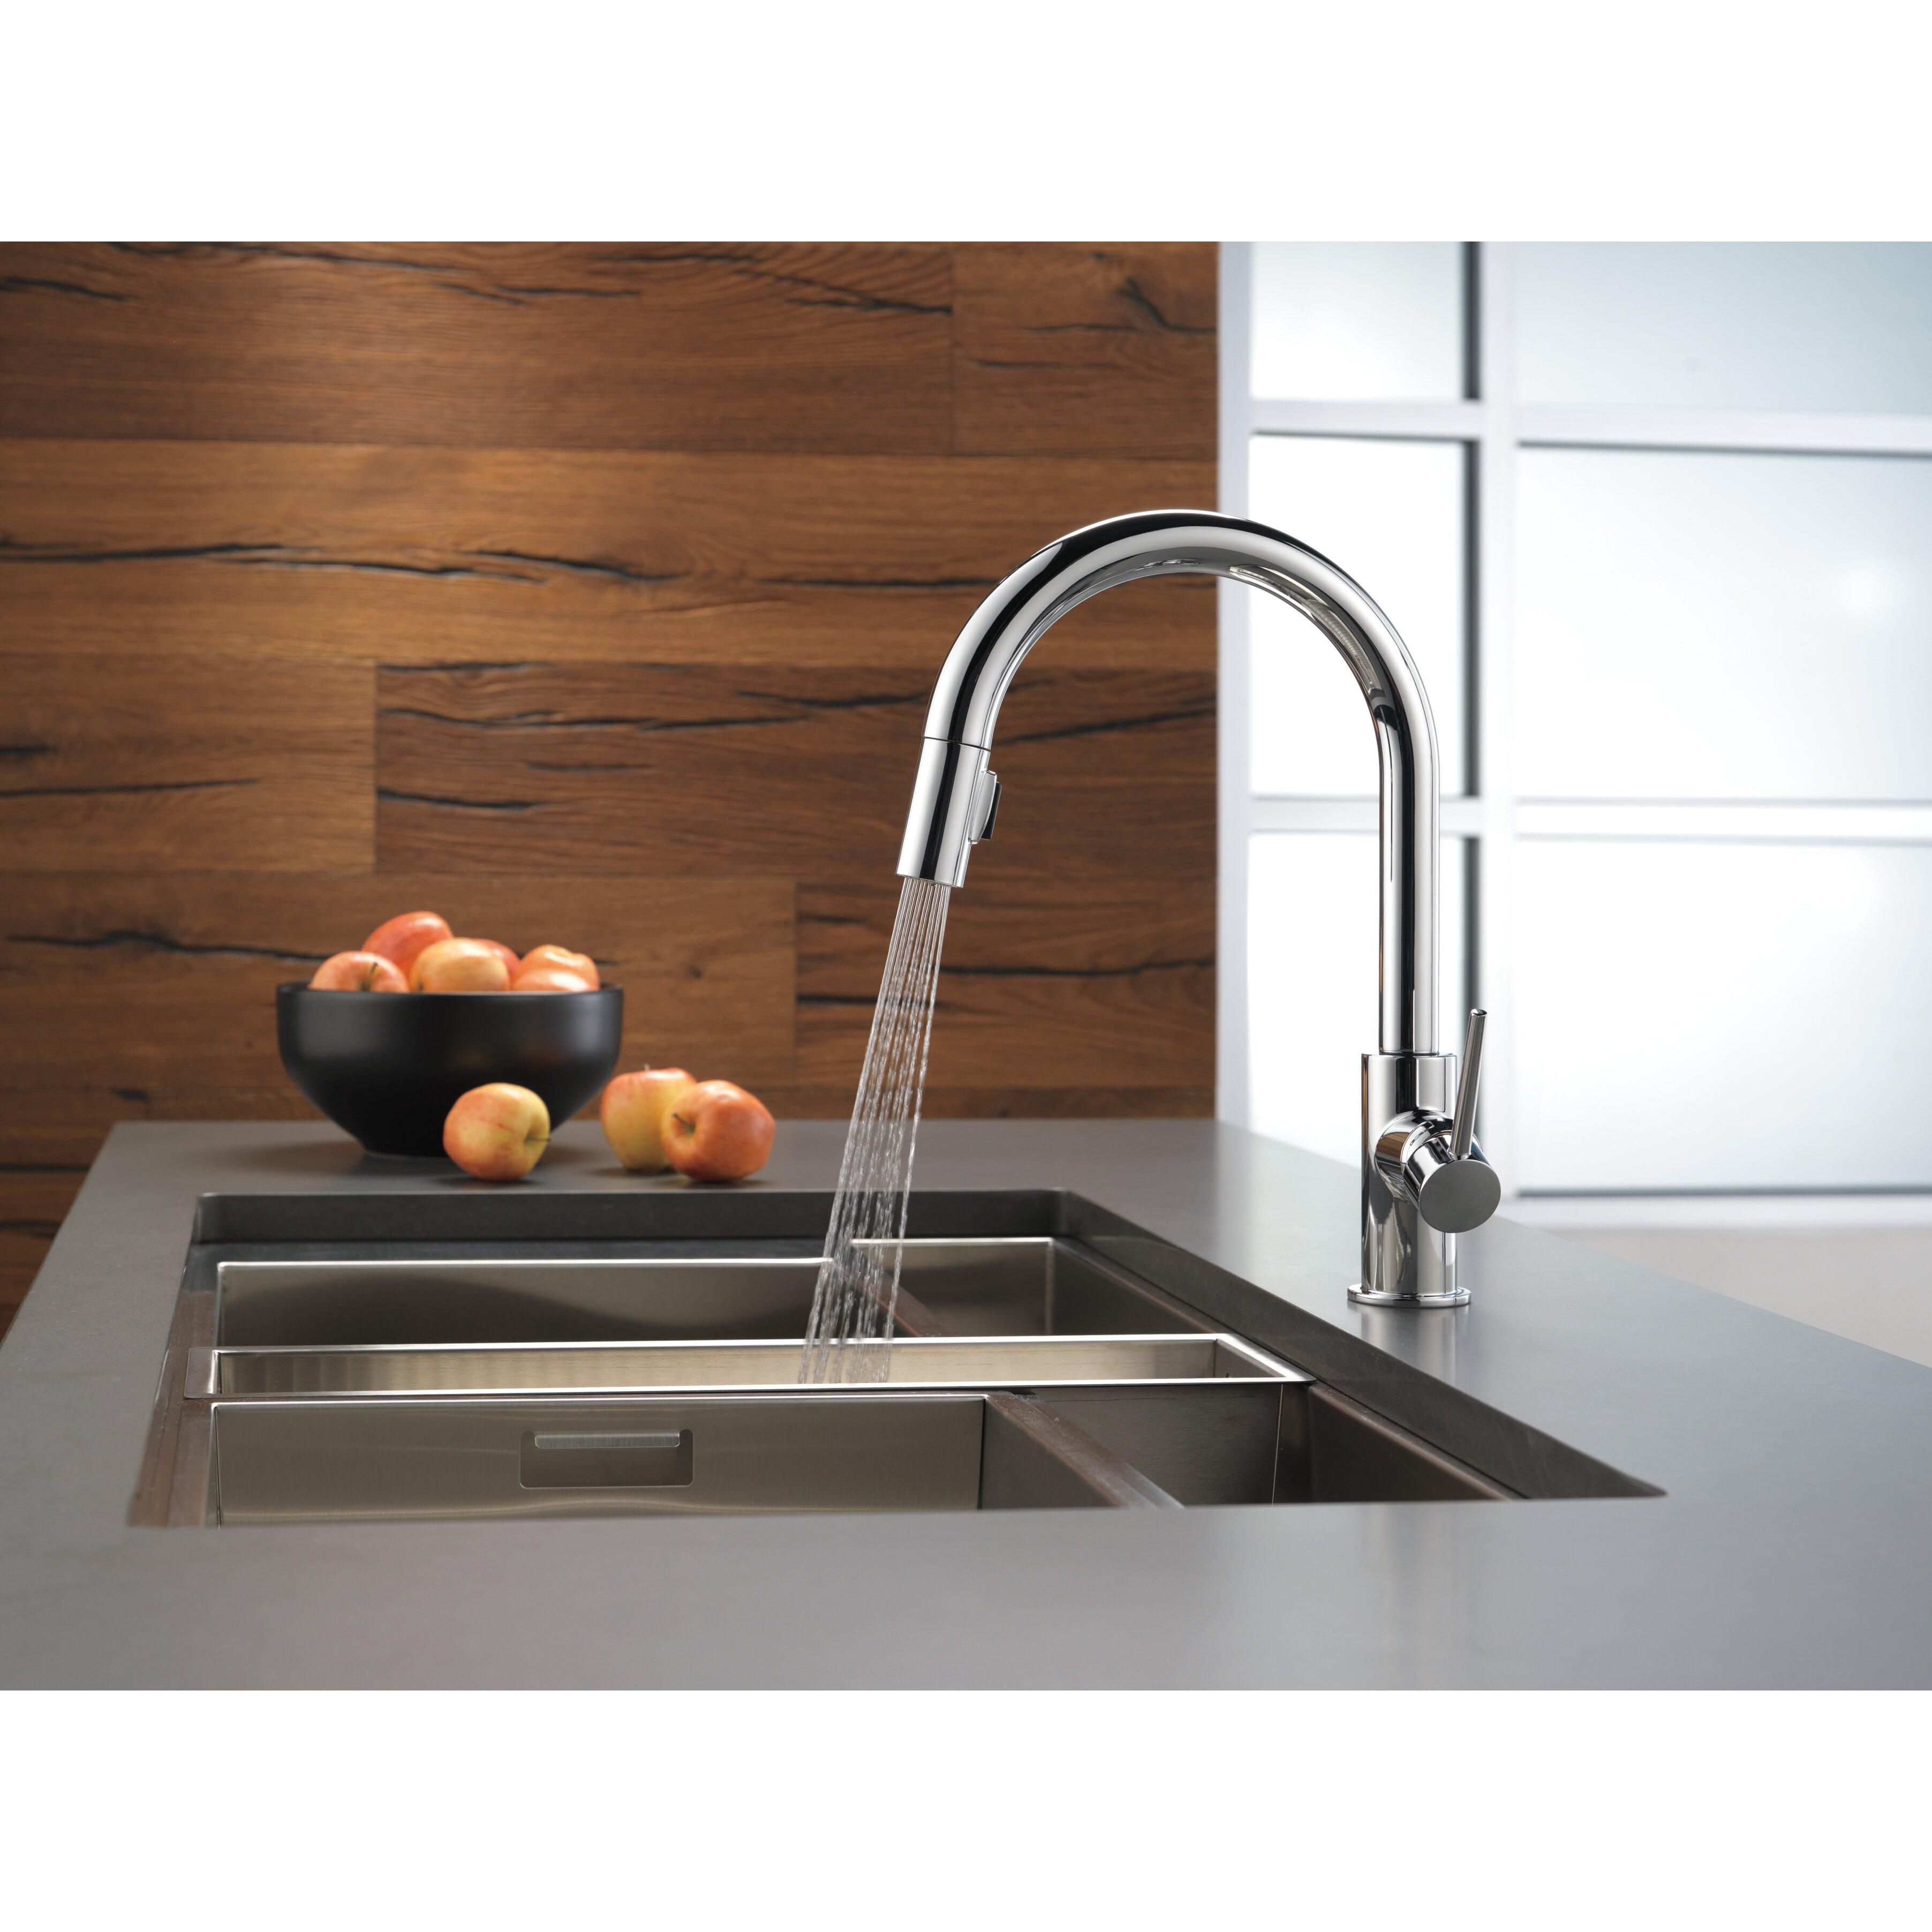 "Delta Trinsic® Kitchen 15"" Single Handle Pull Down"